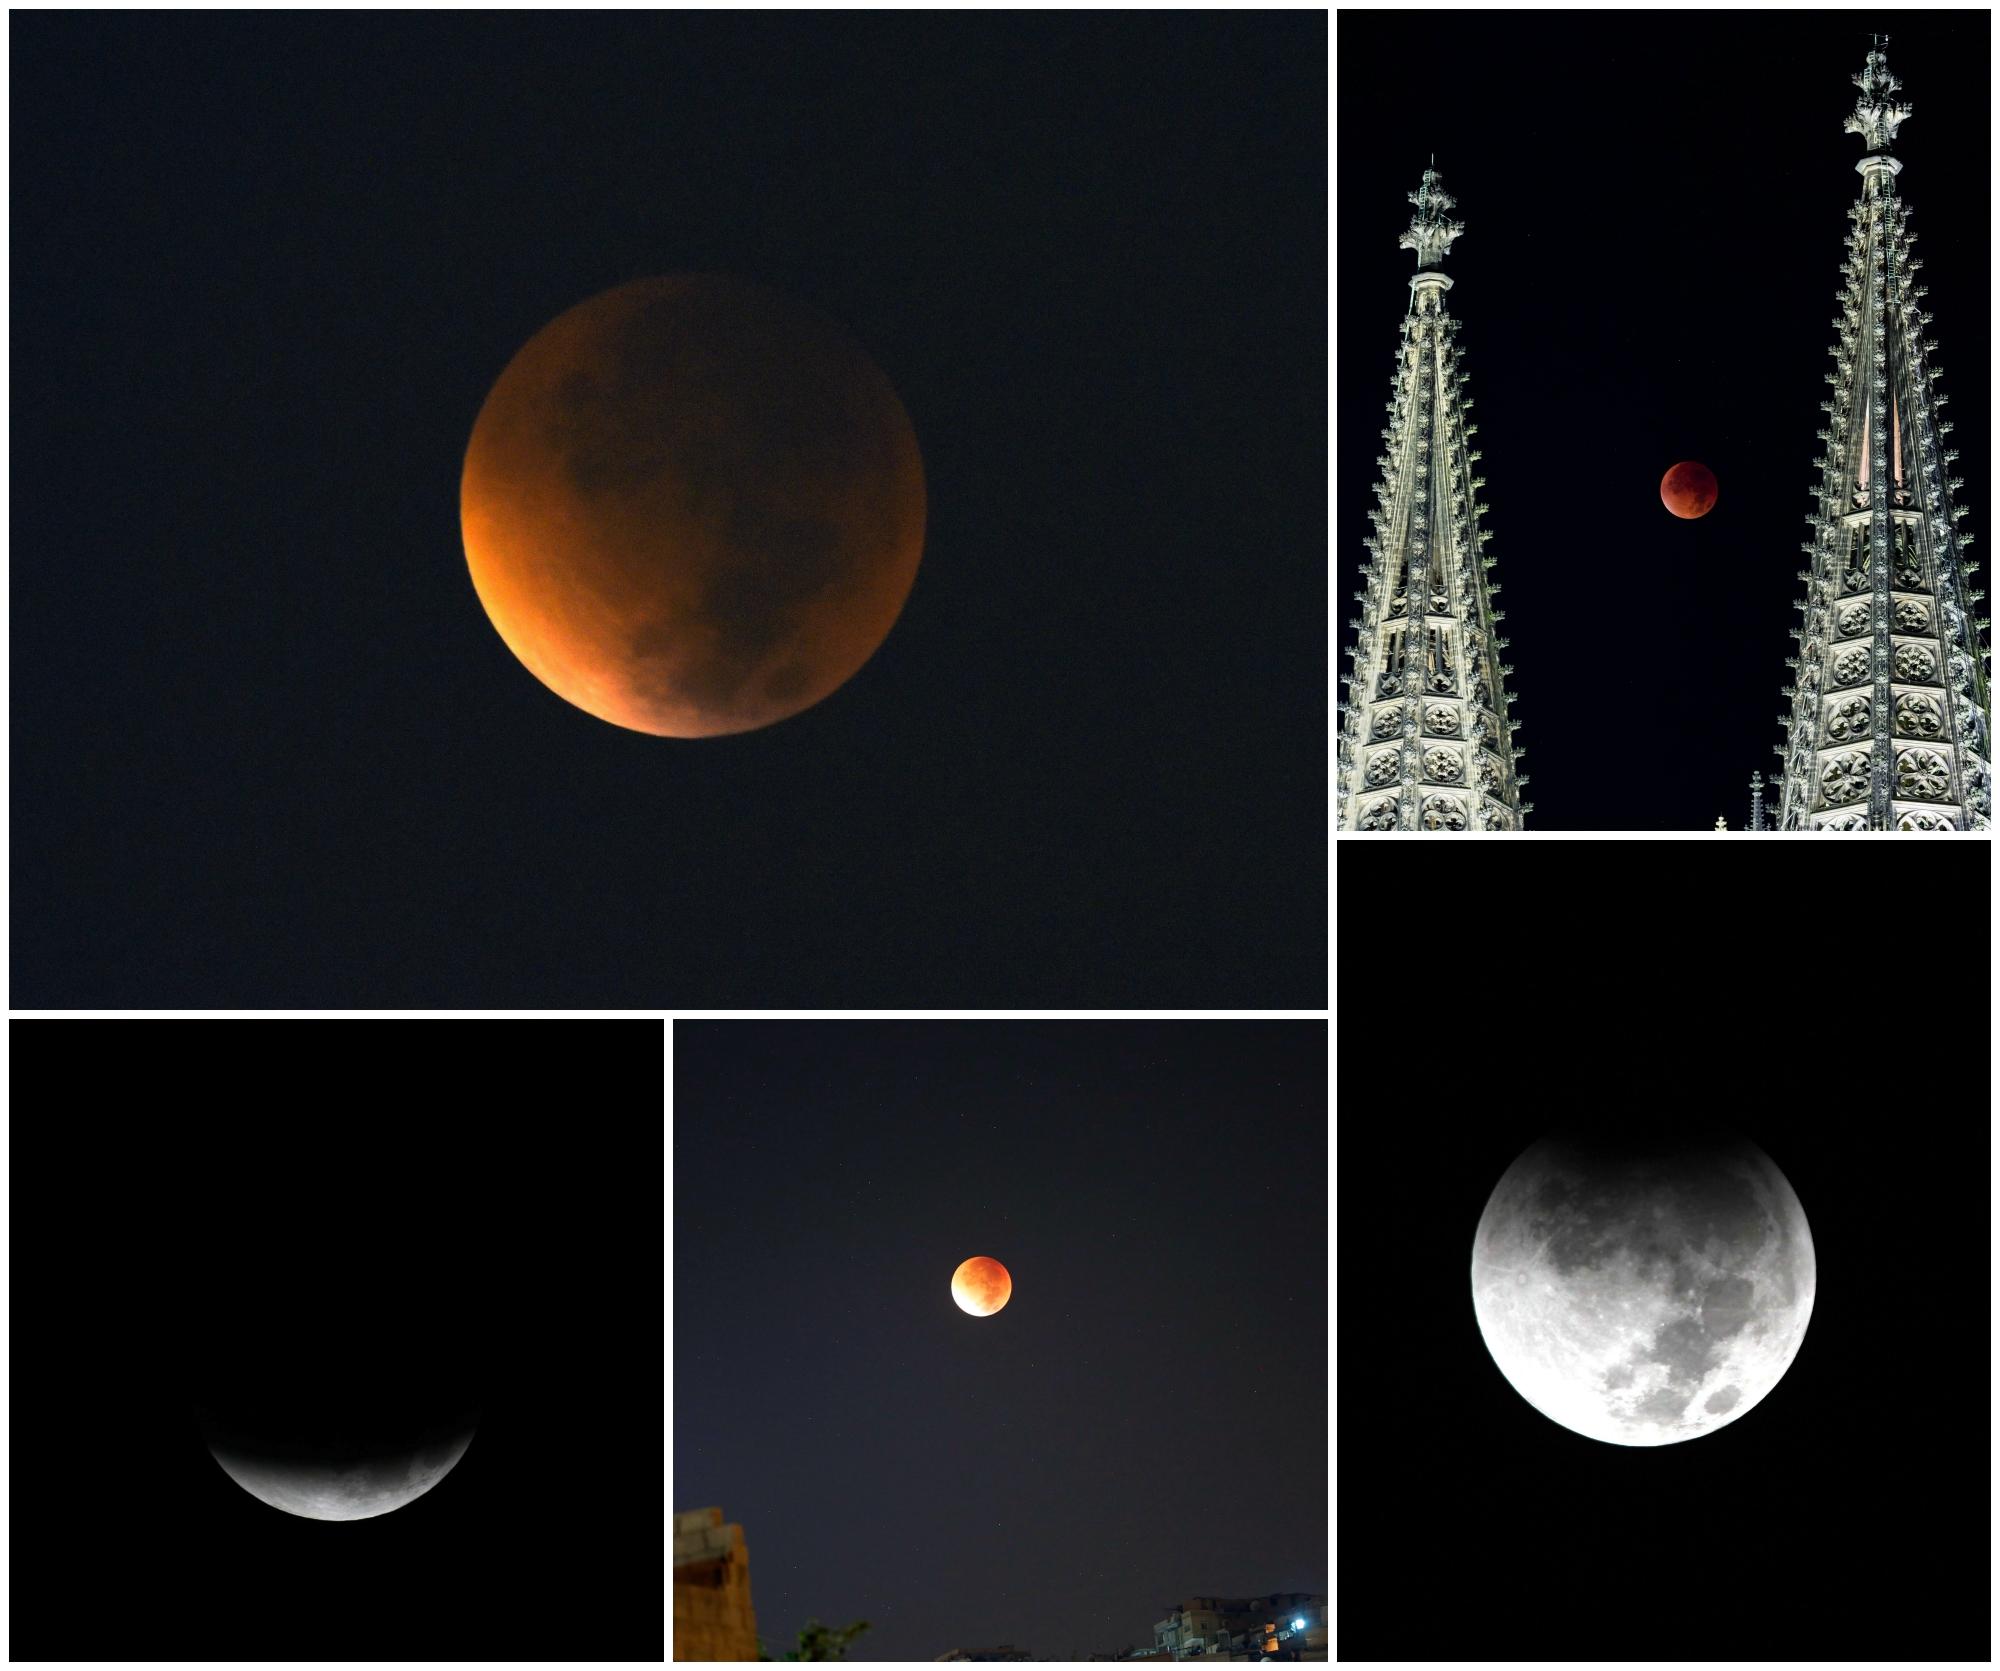 Cum s-a vazut eclipsa de Luna si Super Luna. GALERIE FOTO si VIDEO cu un eveniment astronomic foarte rar